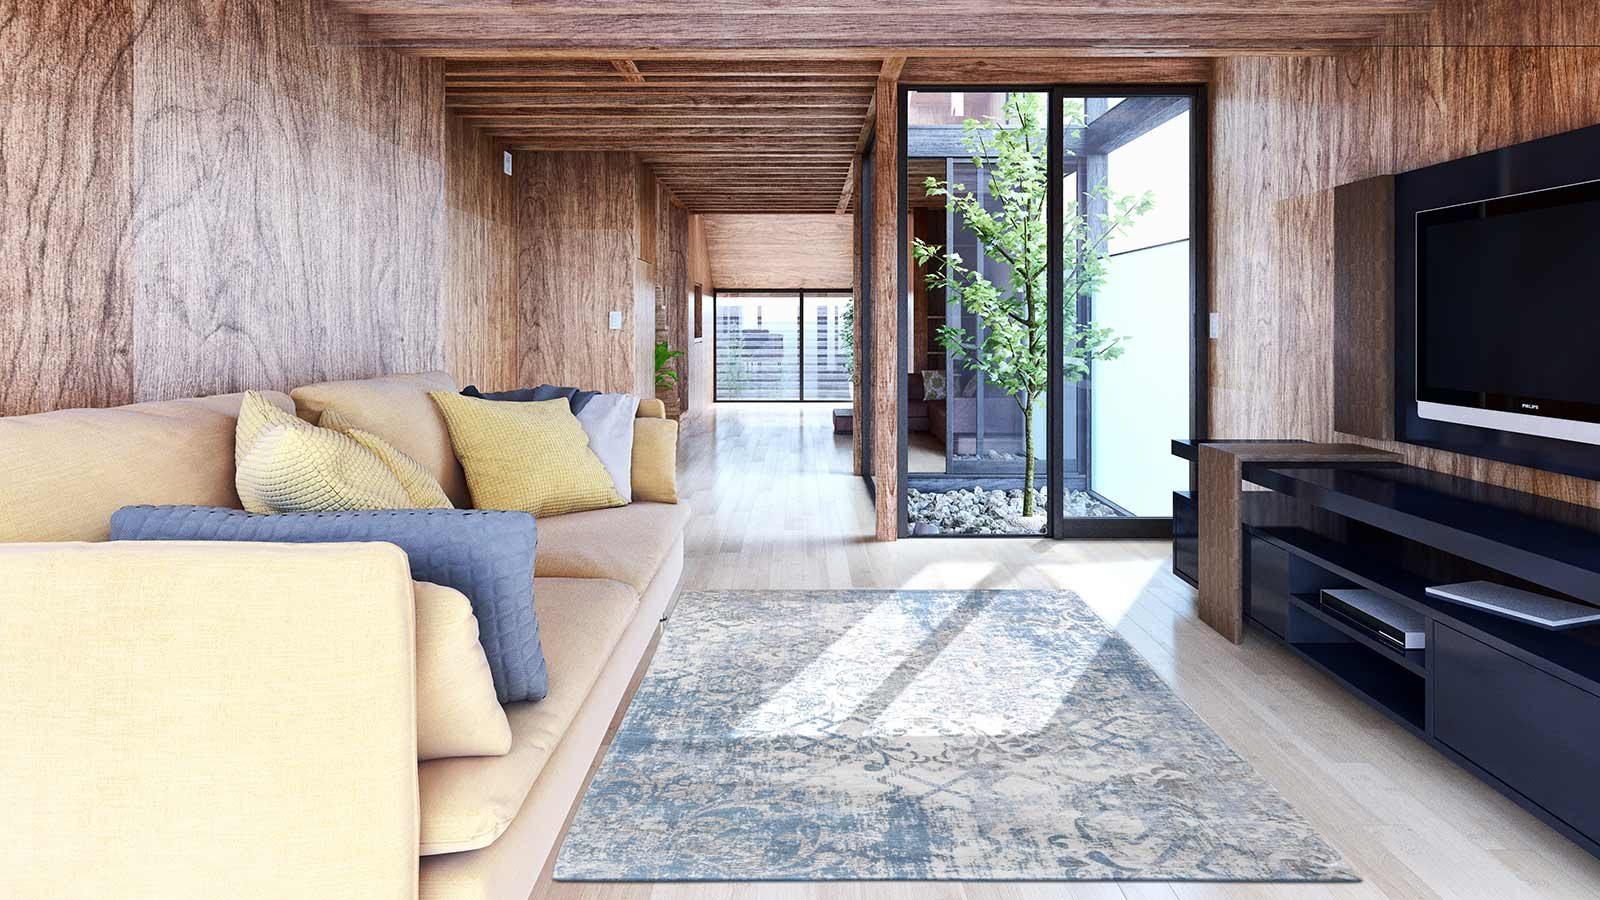 rugs Louis De Poortere LX8545 Fading World Babylon Alhambra interior